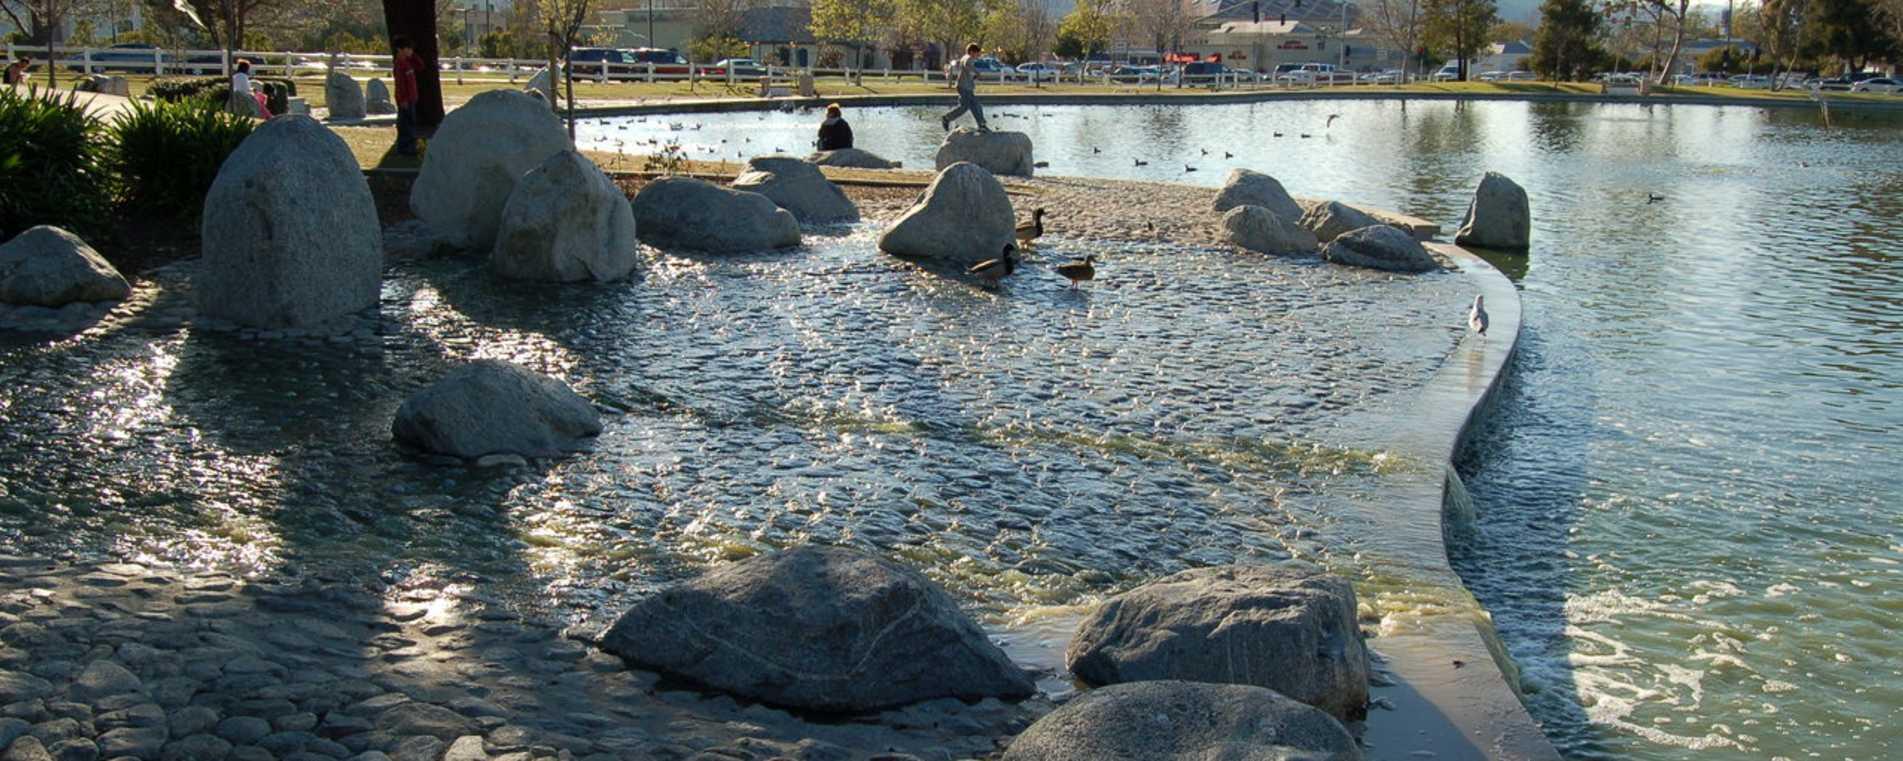 Duck Pond Temecula